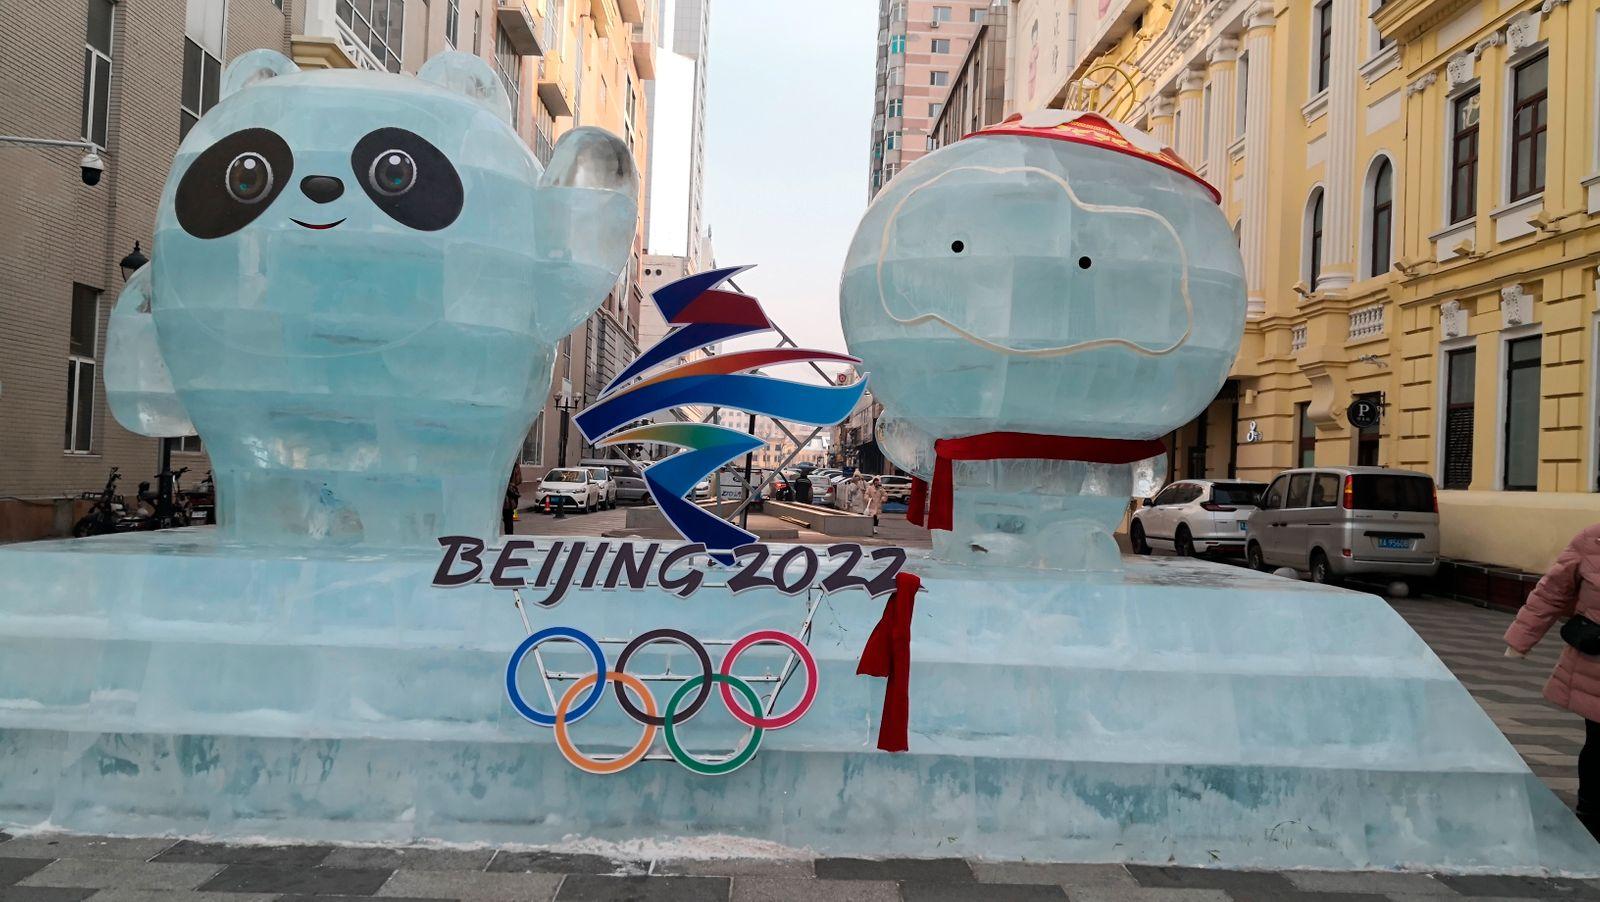 CHINA CHINESE HARBIN 2022 WINTER OLYMPICS MASCOT ICE SCULPTURE